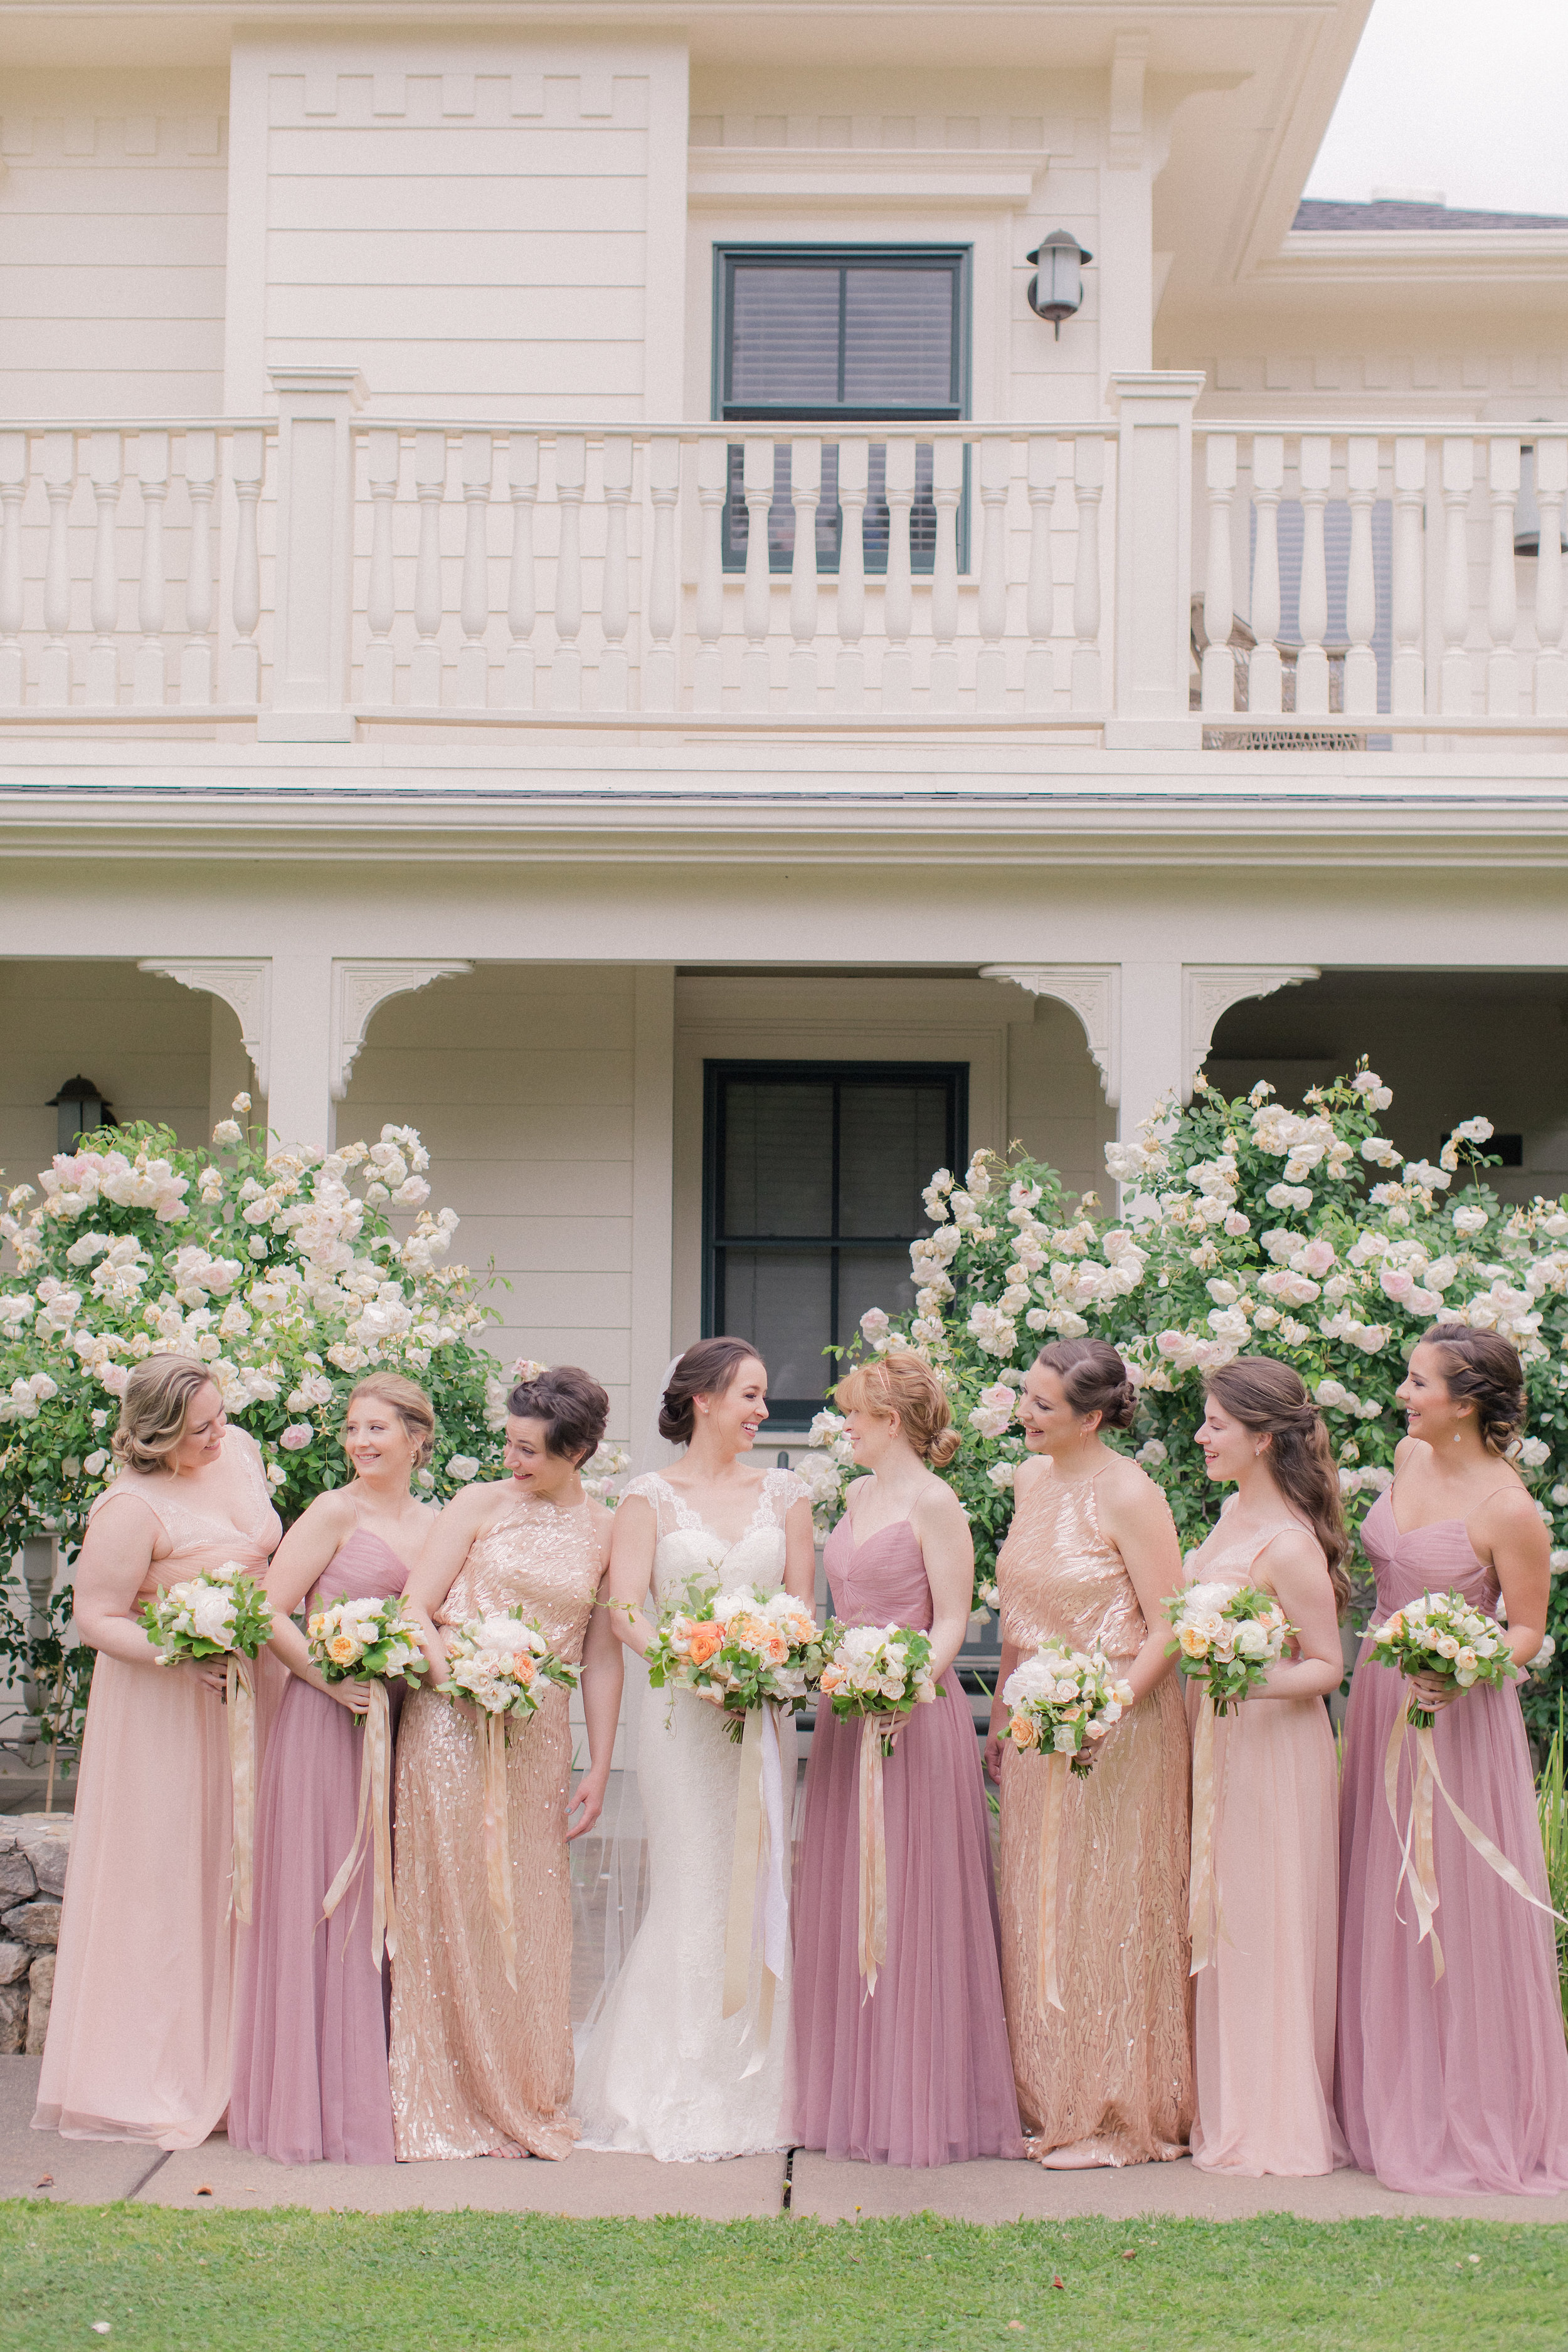 california-wedding-day-lrelyea-events-lori-paladino-photography2.jpg